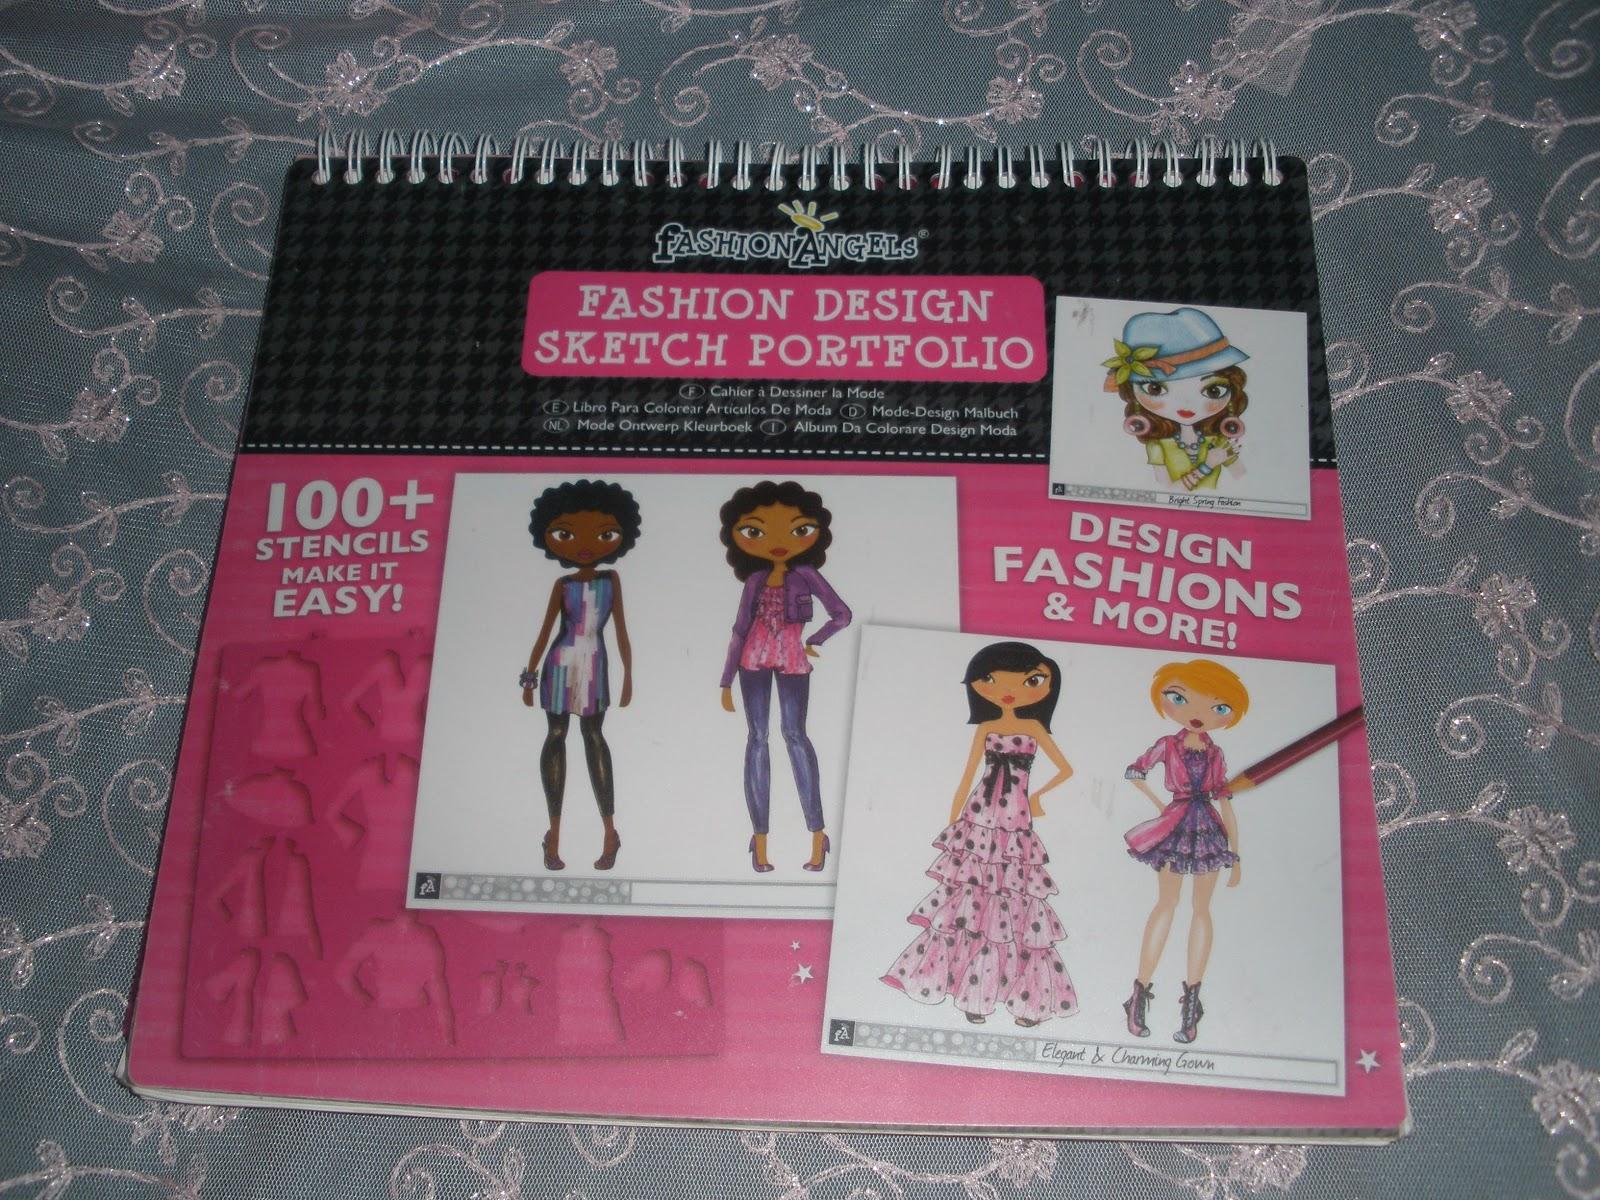 Project runway fashion design sketch portfolio 32